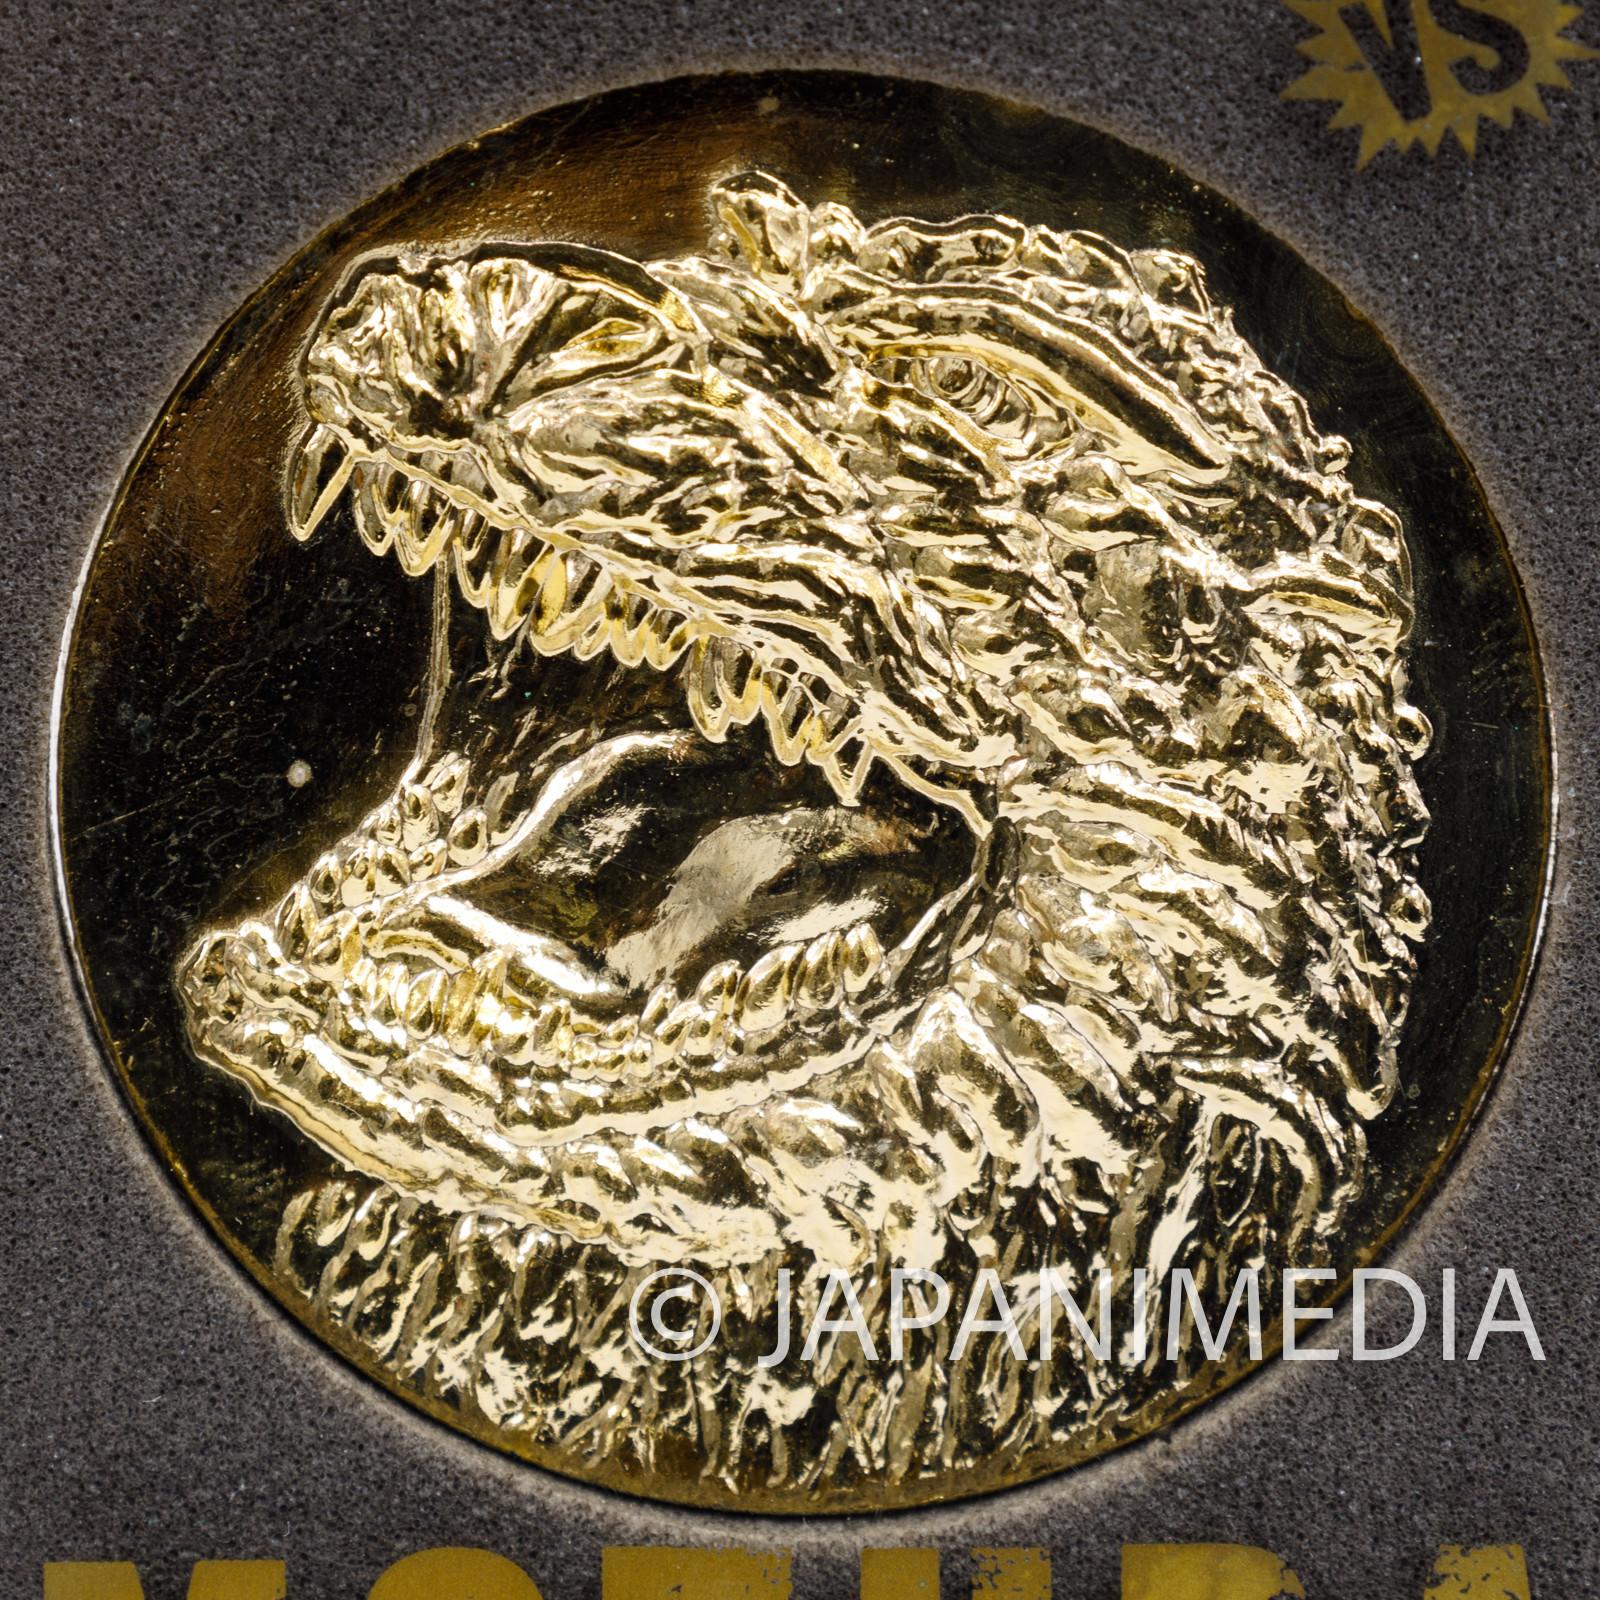 Godzilla vs Mothra Movie 1992 Memorial Medal Toho JAPAN TOKUSATSU